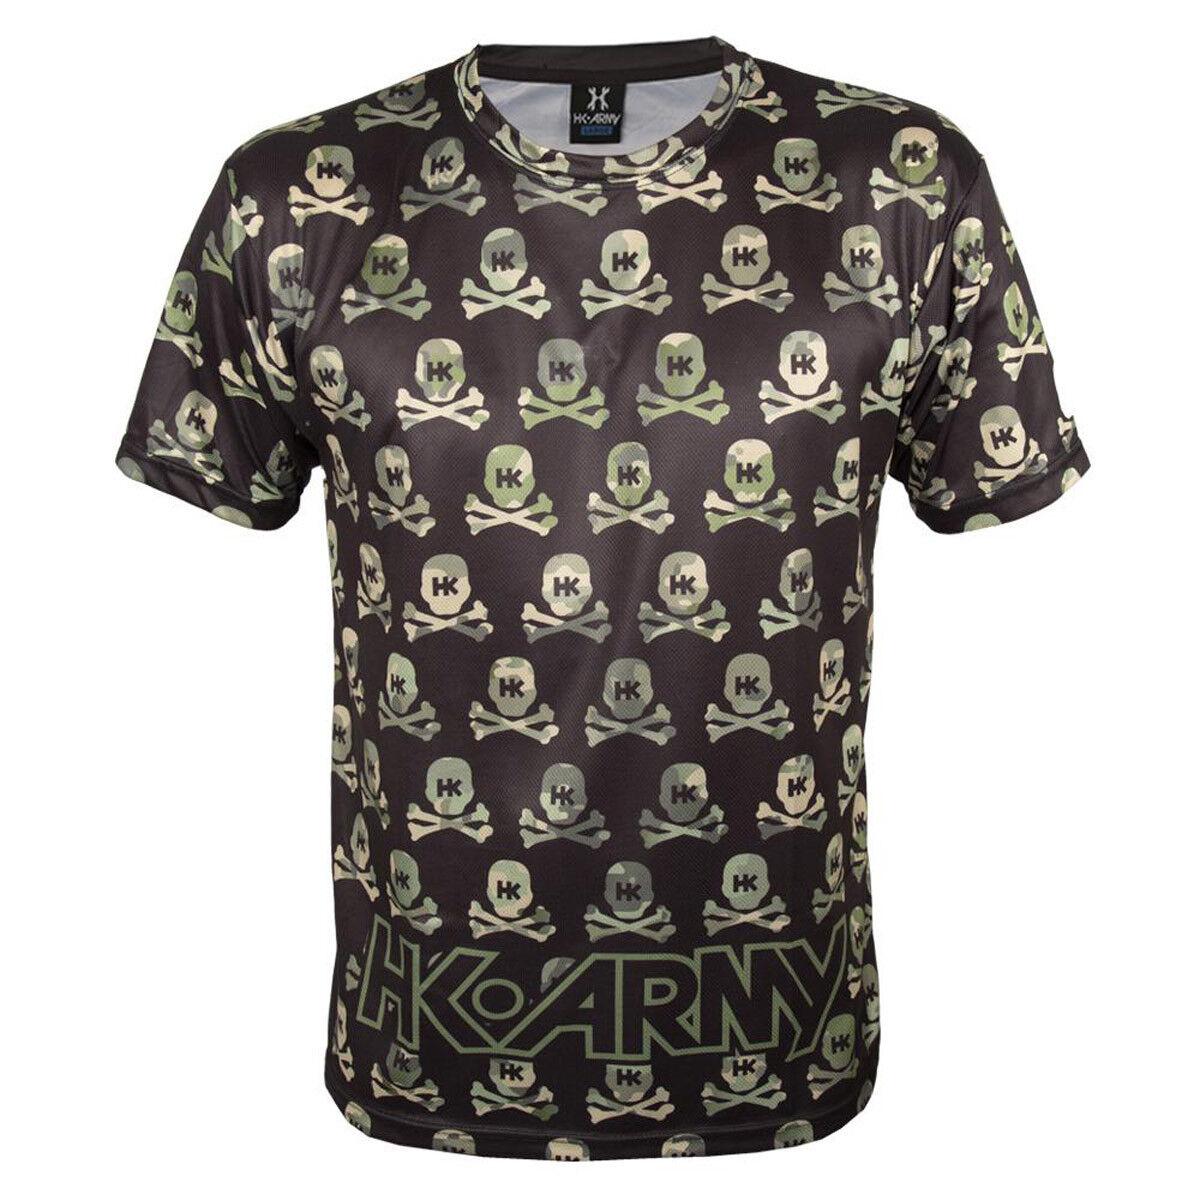 HK Army Dri Fit T-Shirt - All Over - Recon Camo Skulls - Medium